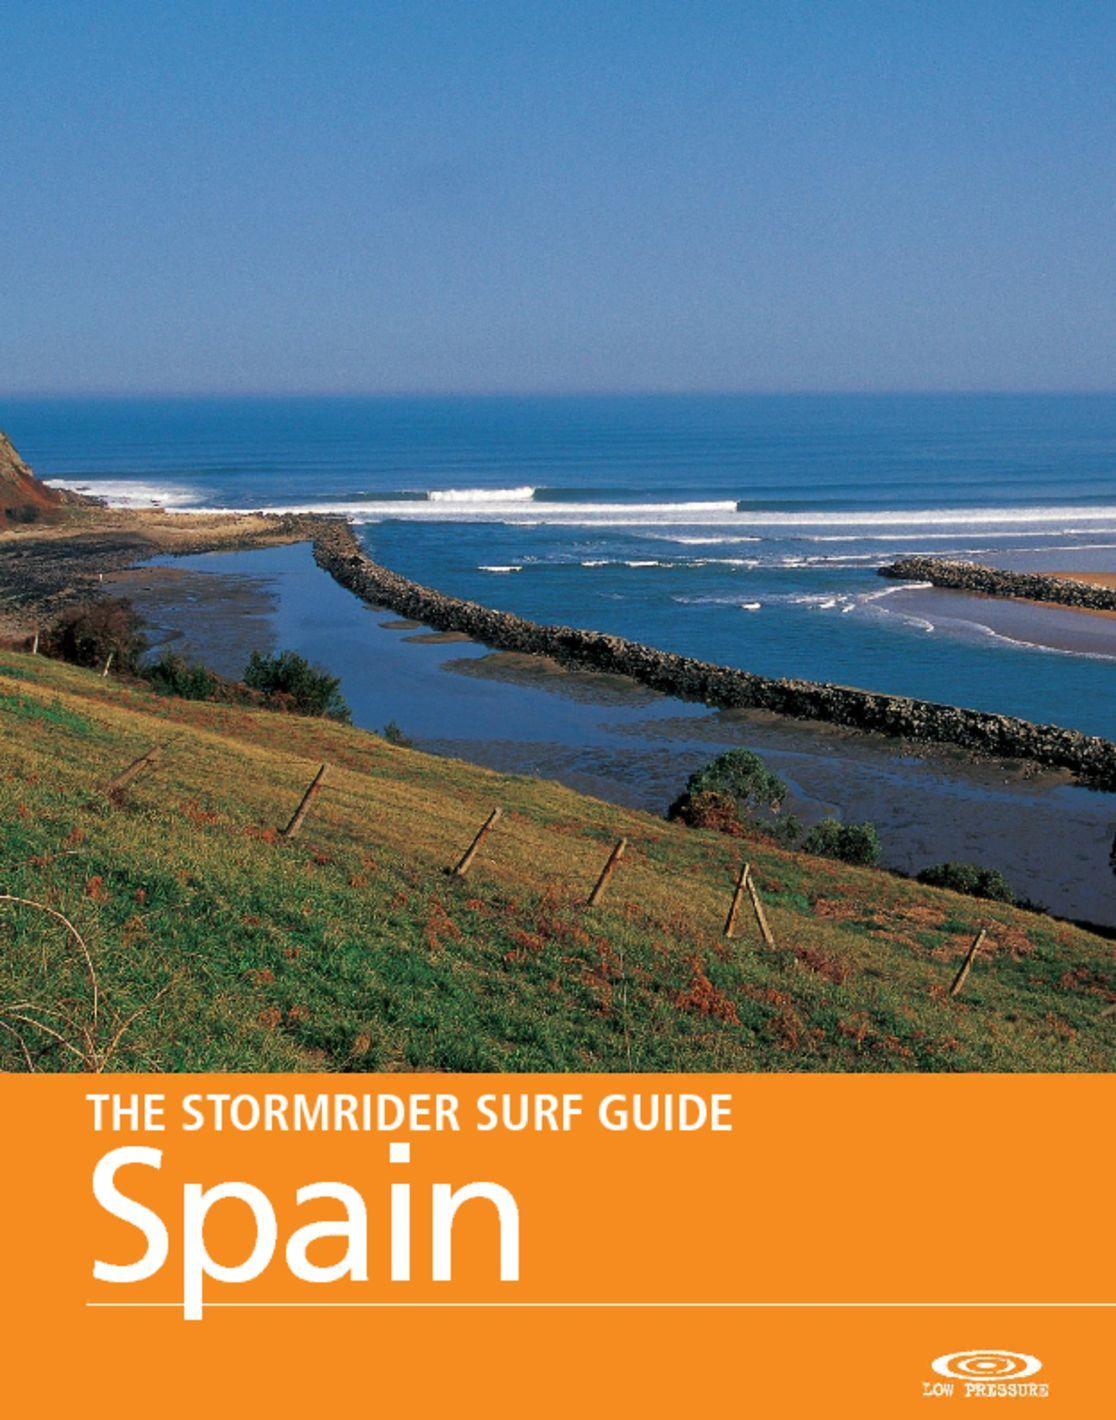 The Stormrider Surf Guide Spain Digital